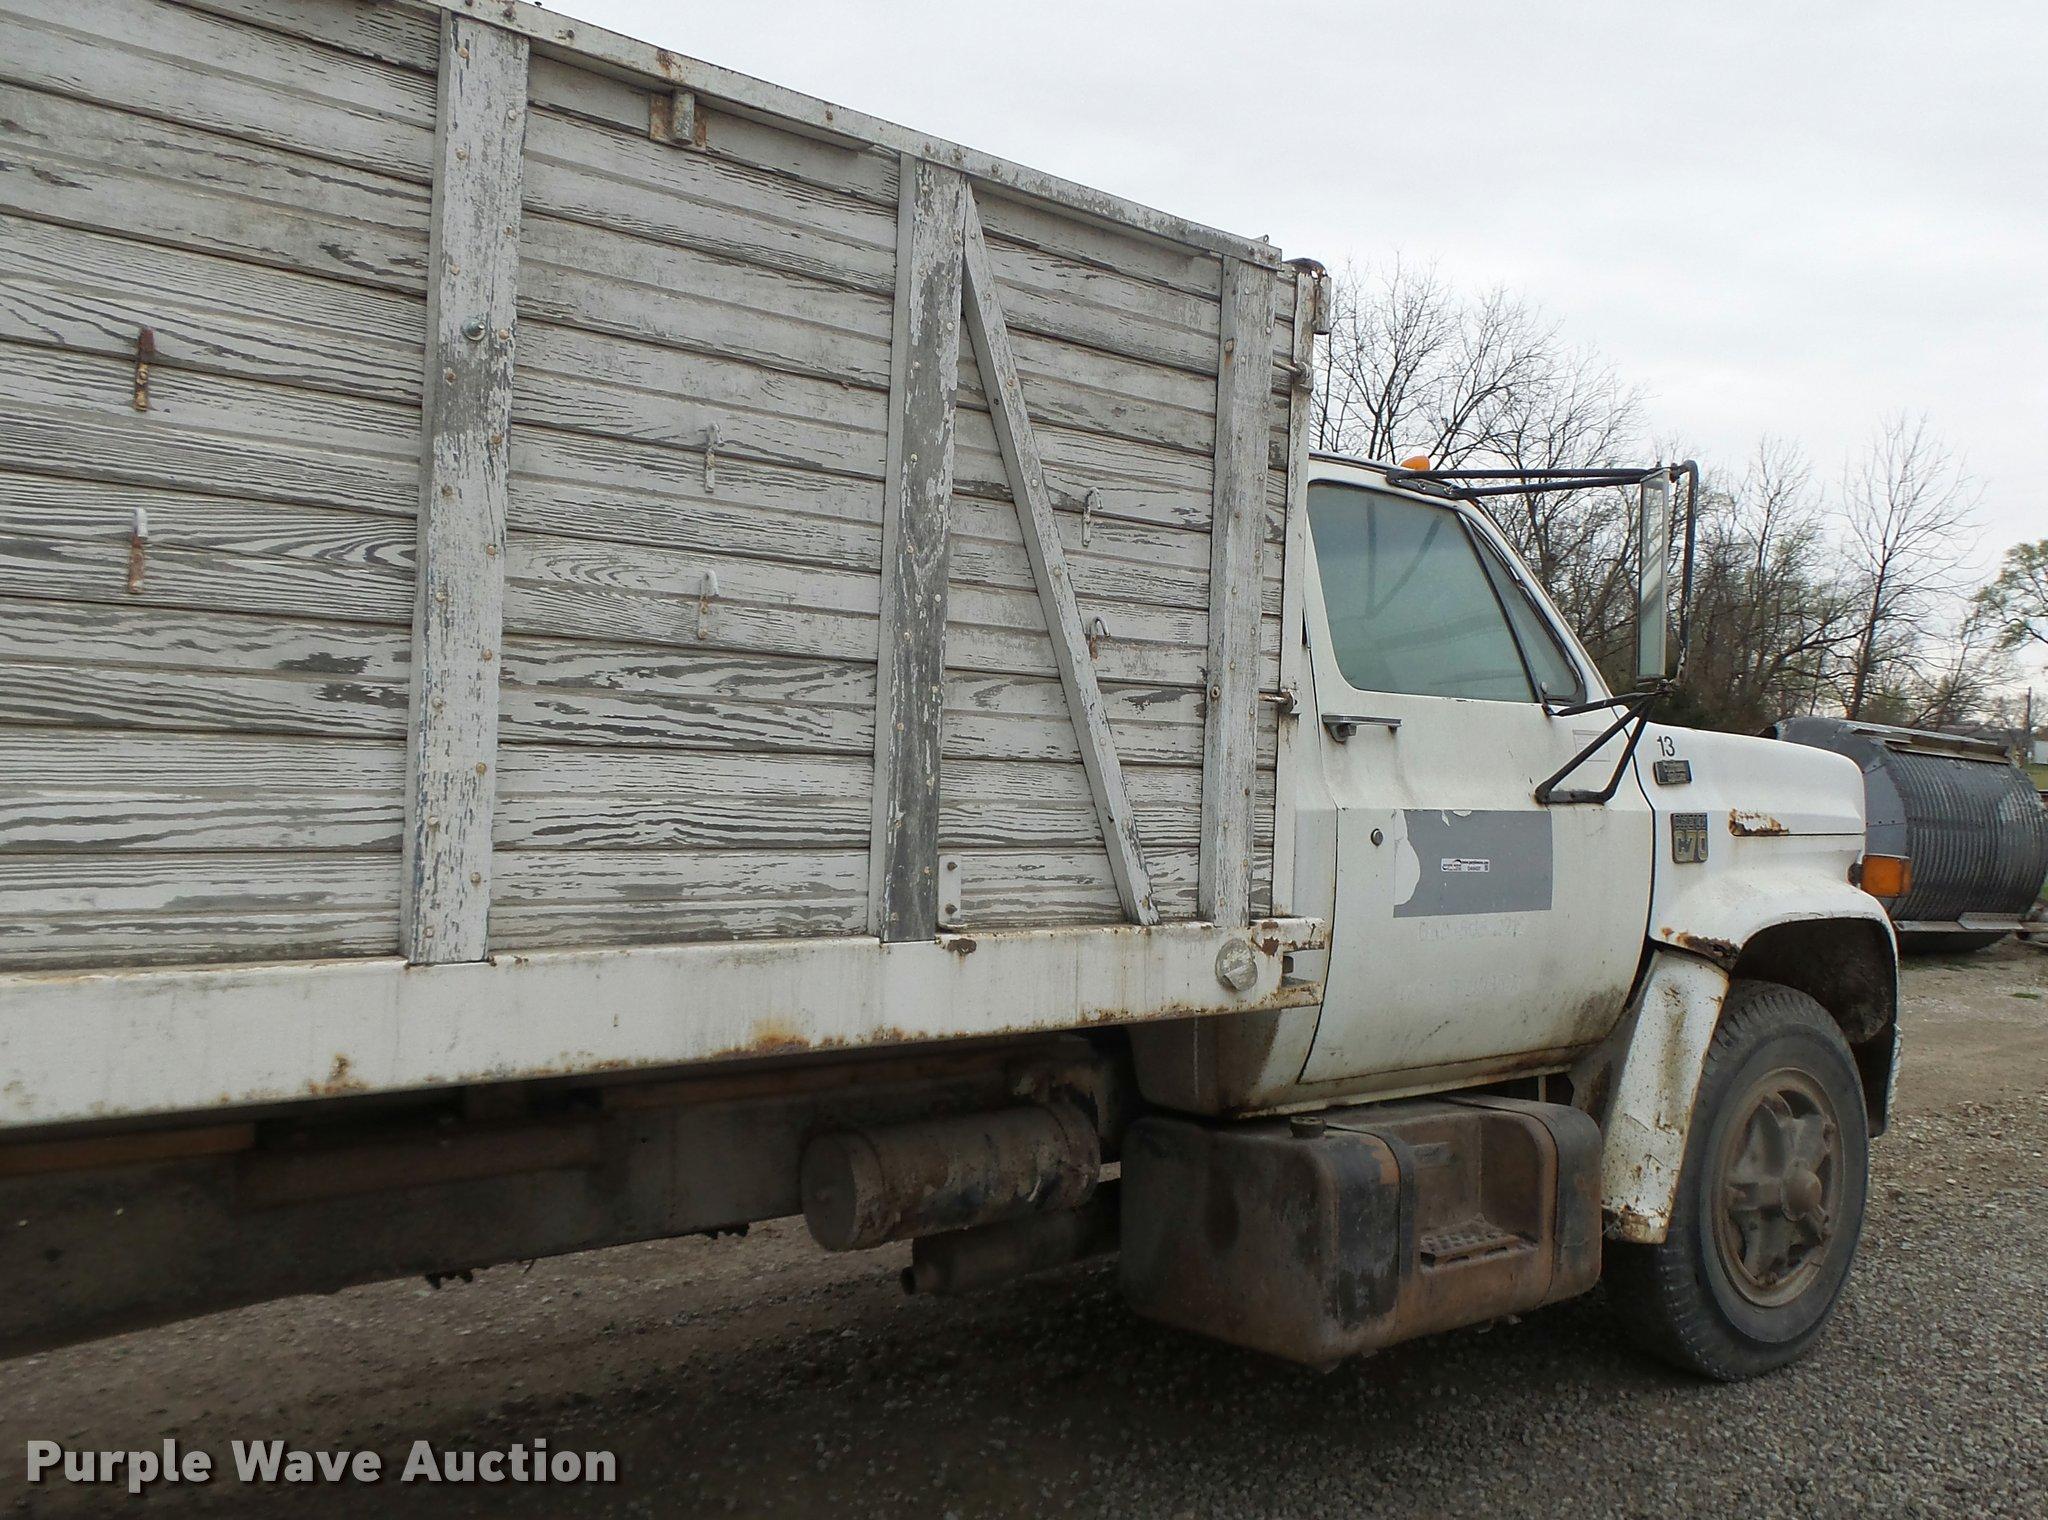 1979 chevrolet c70 grain truck full size in new window